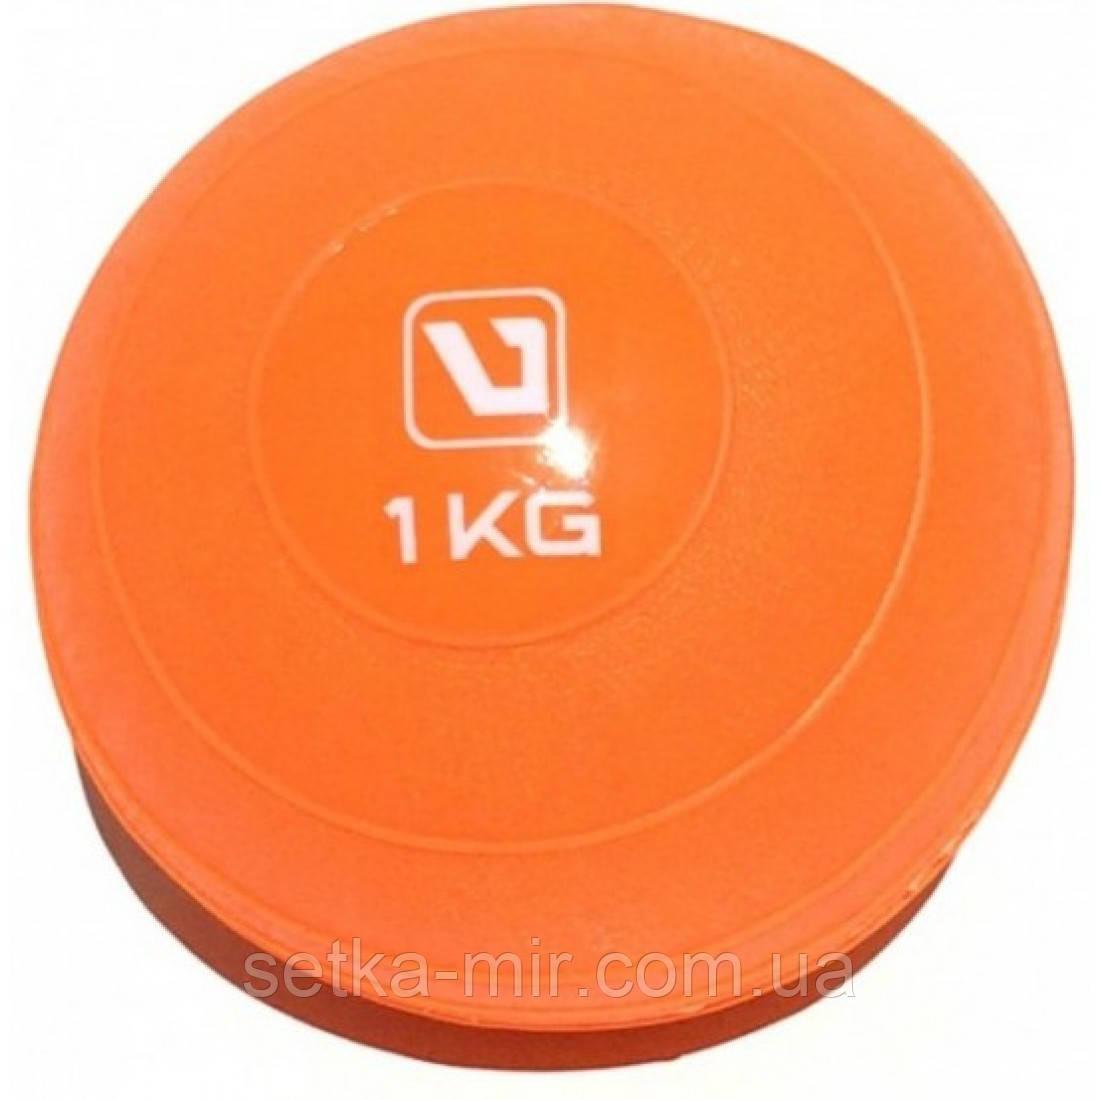 Медбол мягкий набивной LiveUp SOFT WEIGHT BALL, 1 кг